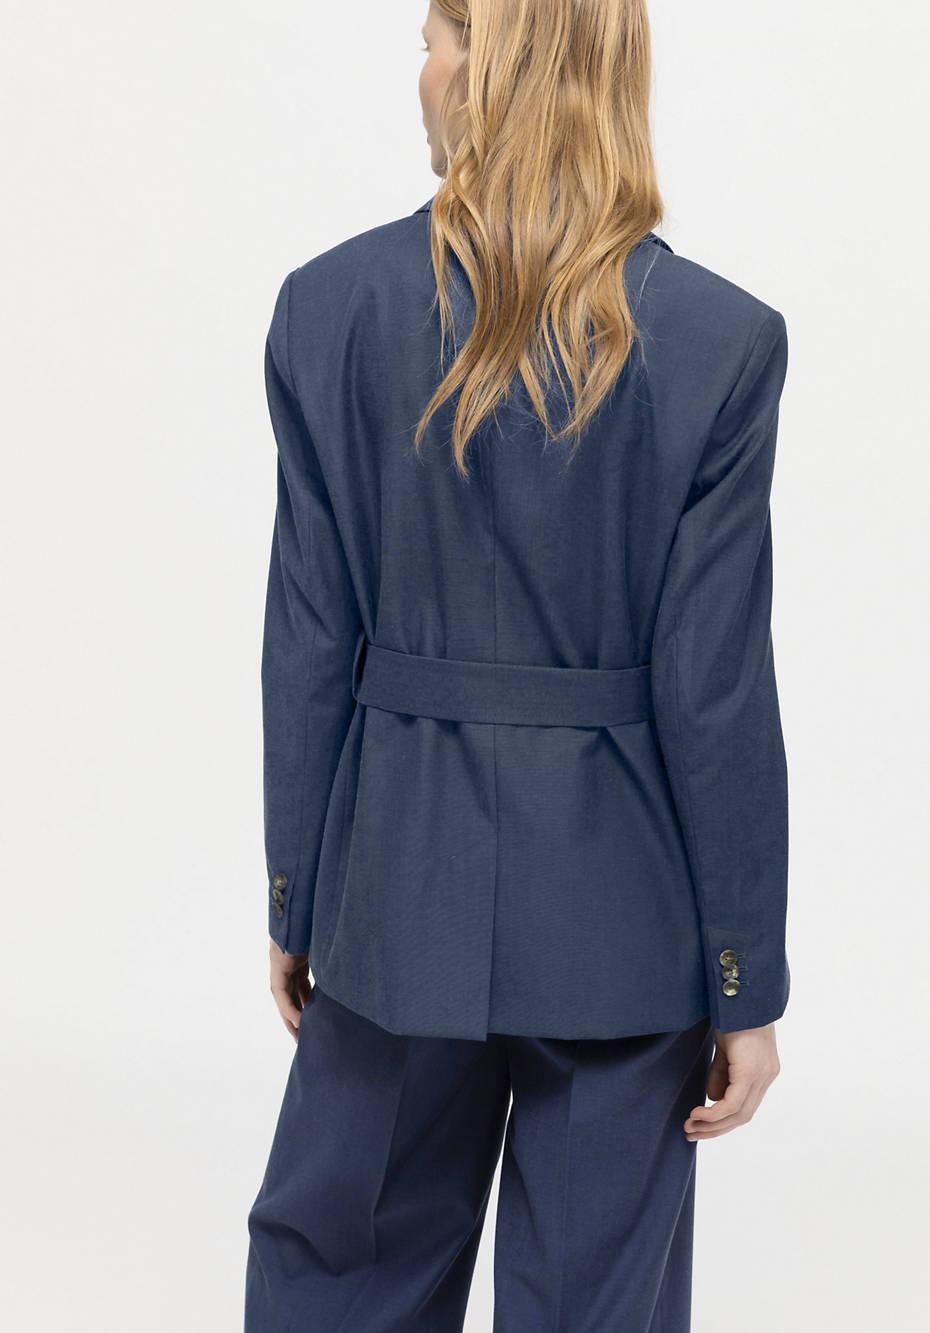 Blazer made of organic merino wool with organic cotton